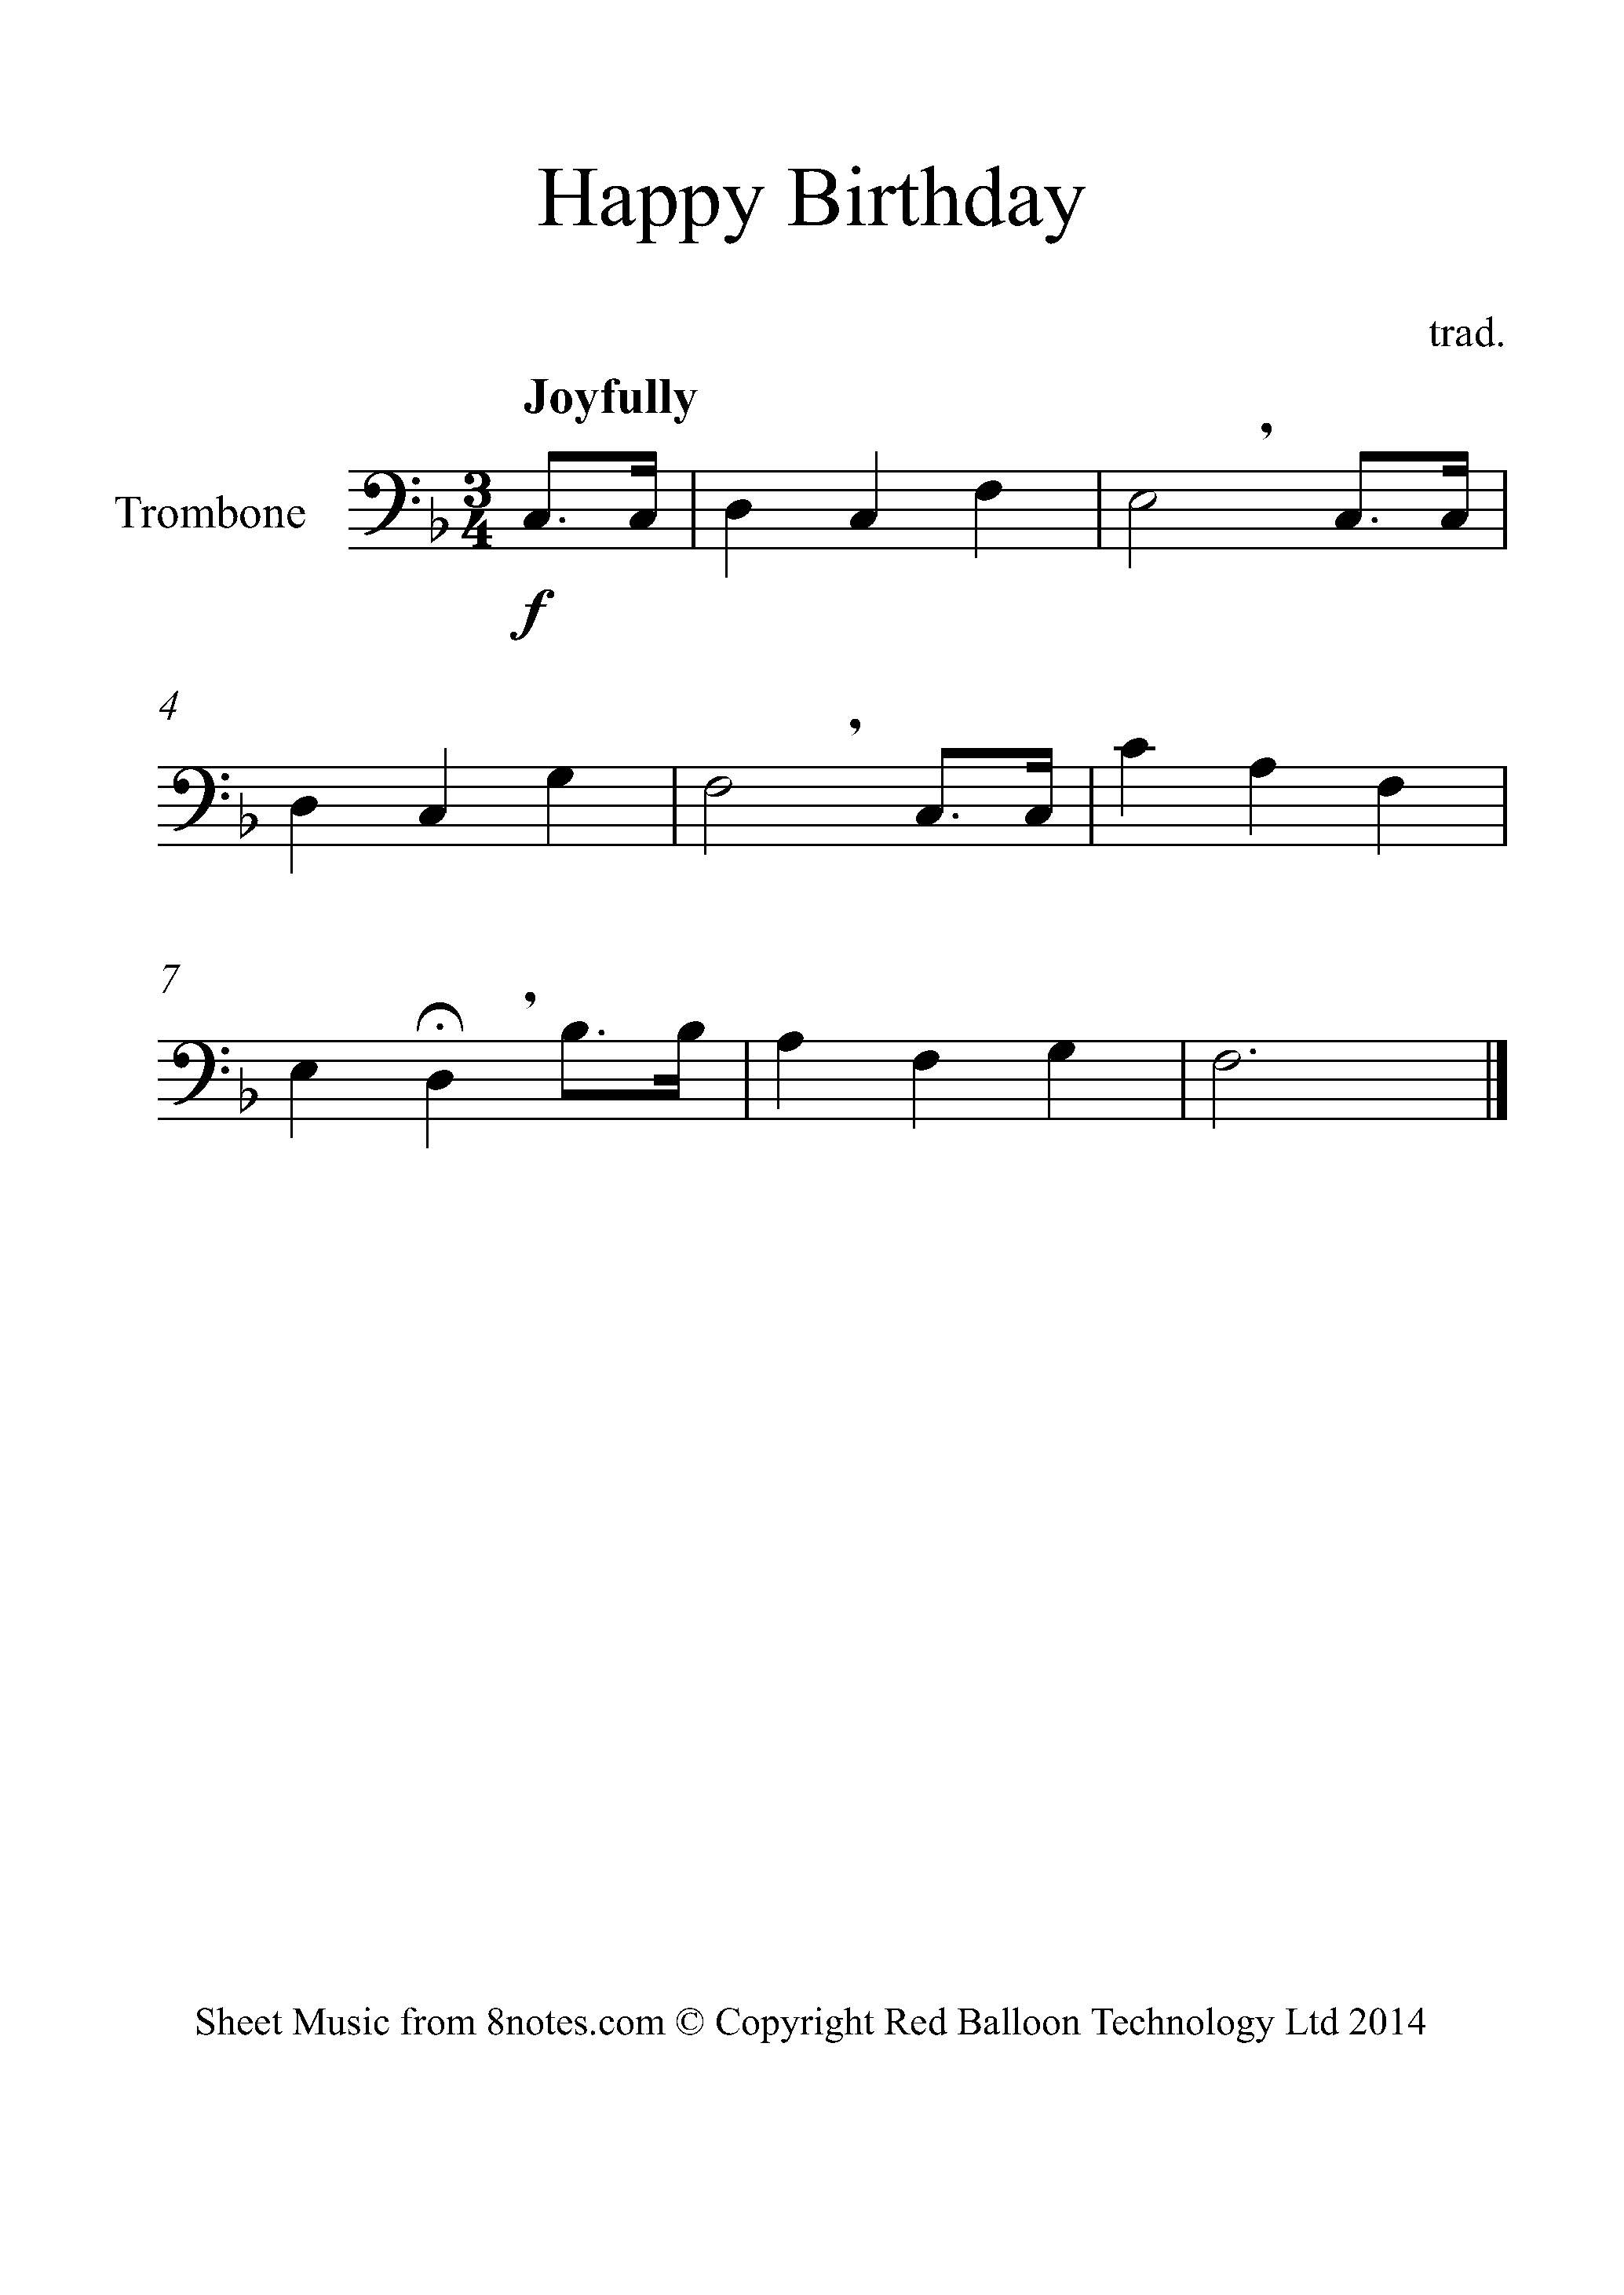 Happy Birthday Sheet Music For Trombone 8notes Com